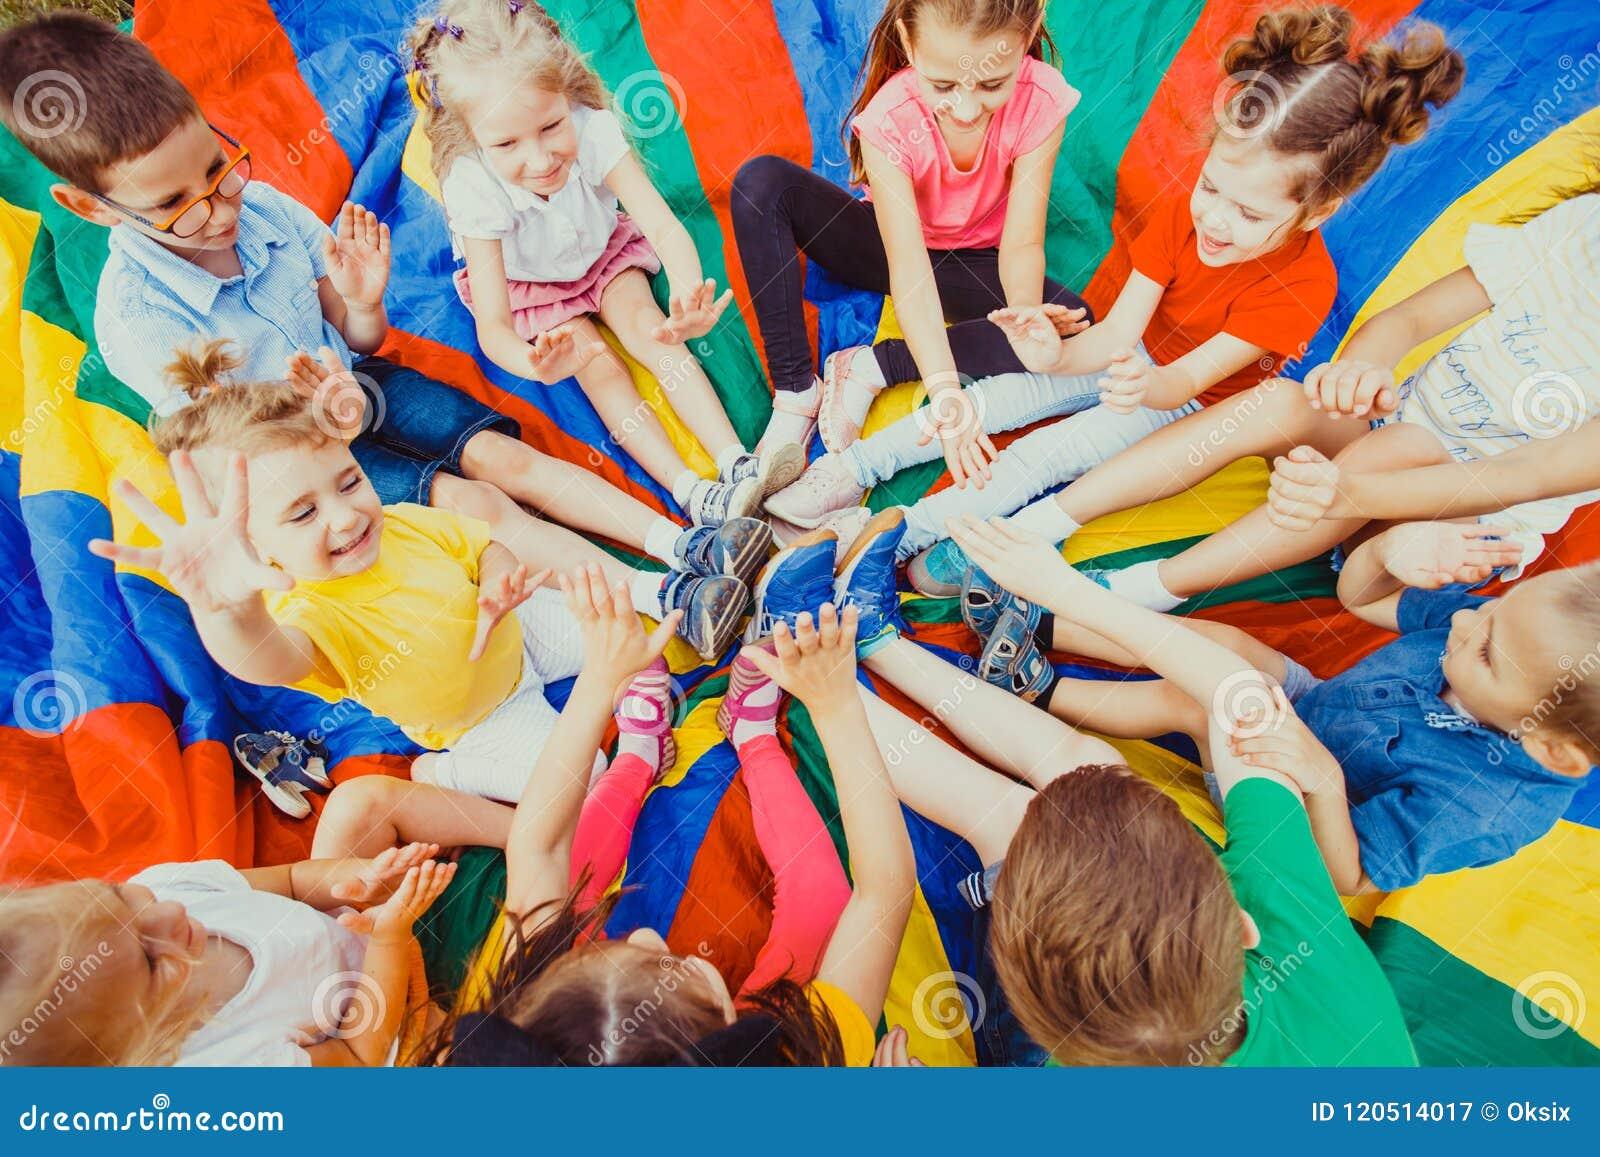 Download Kids Holding Hands Together Stock Image - Image of activity, garden: 120514017